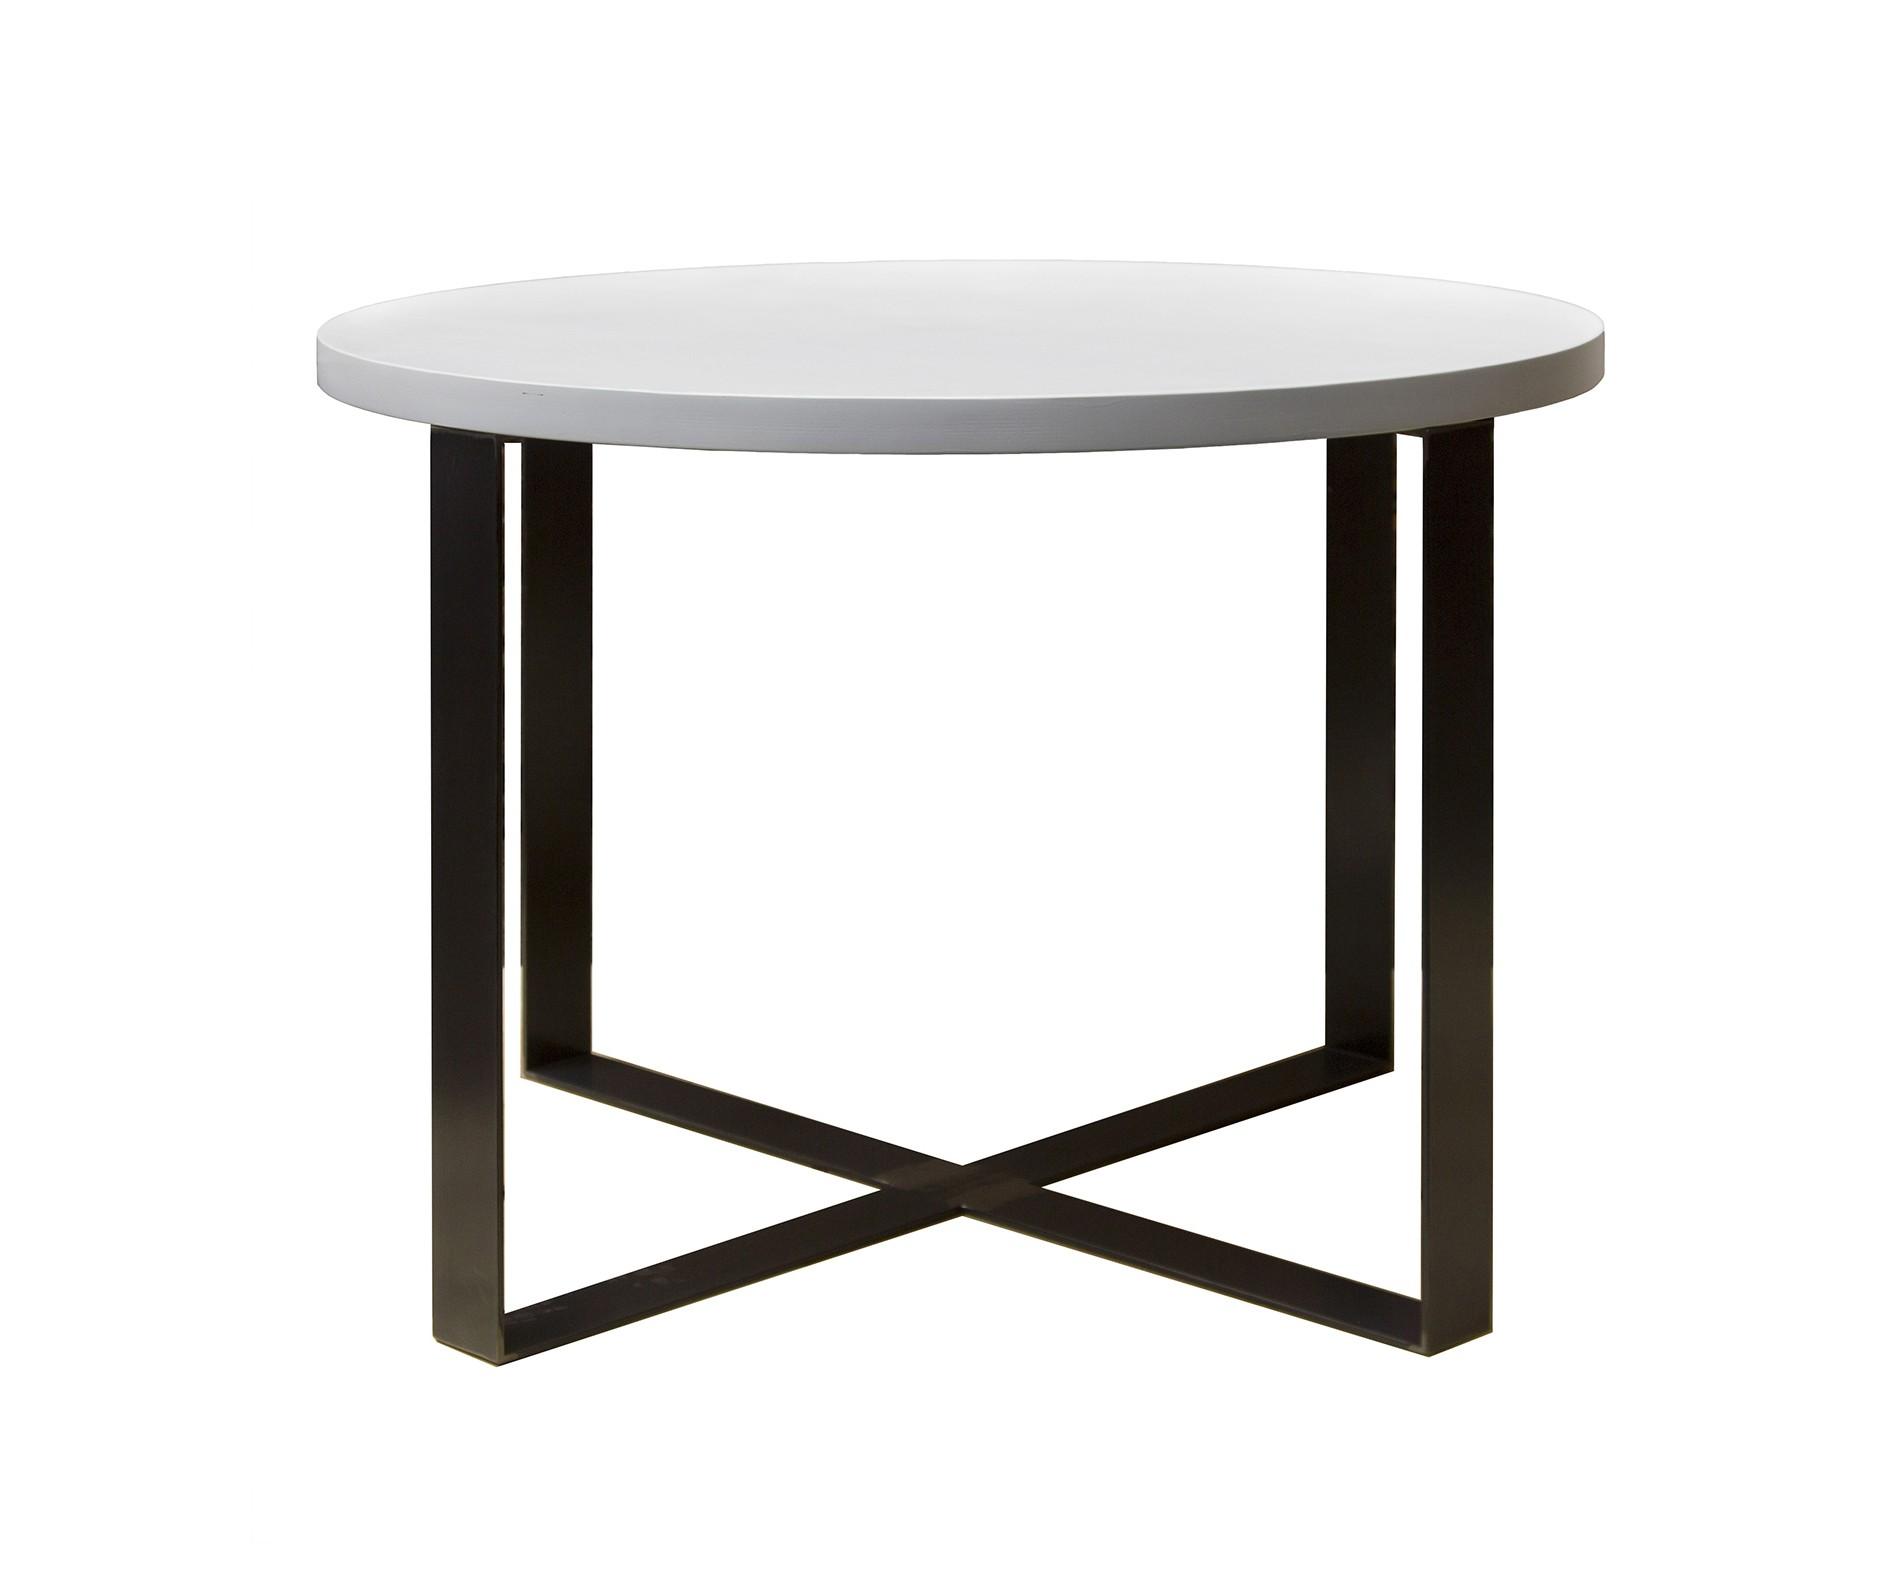 Кухонный стол Archpole 15429344 от thefurnish